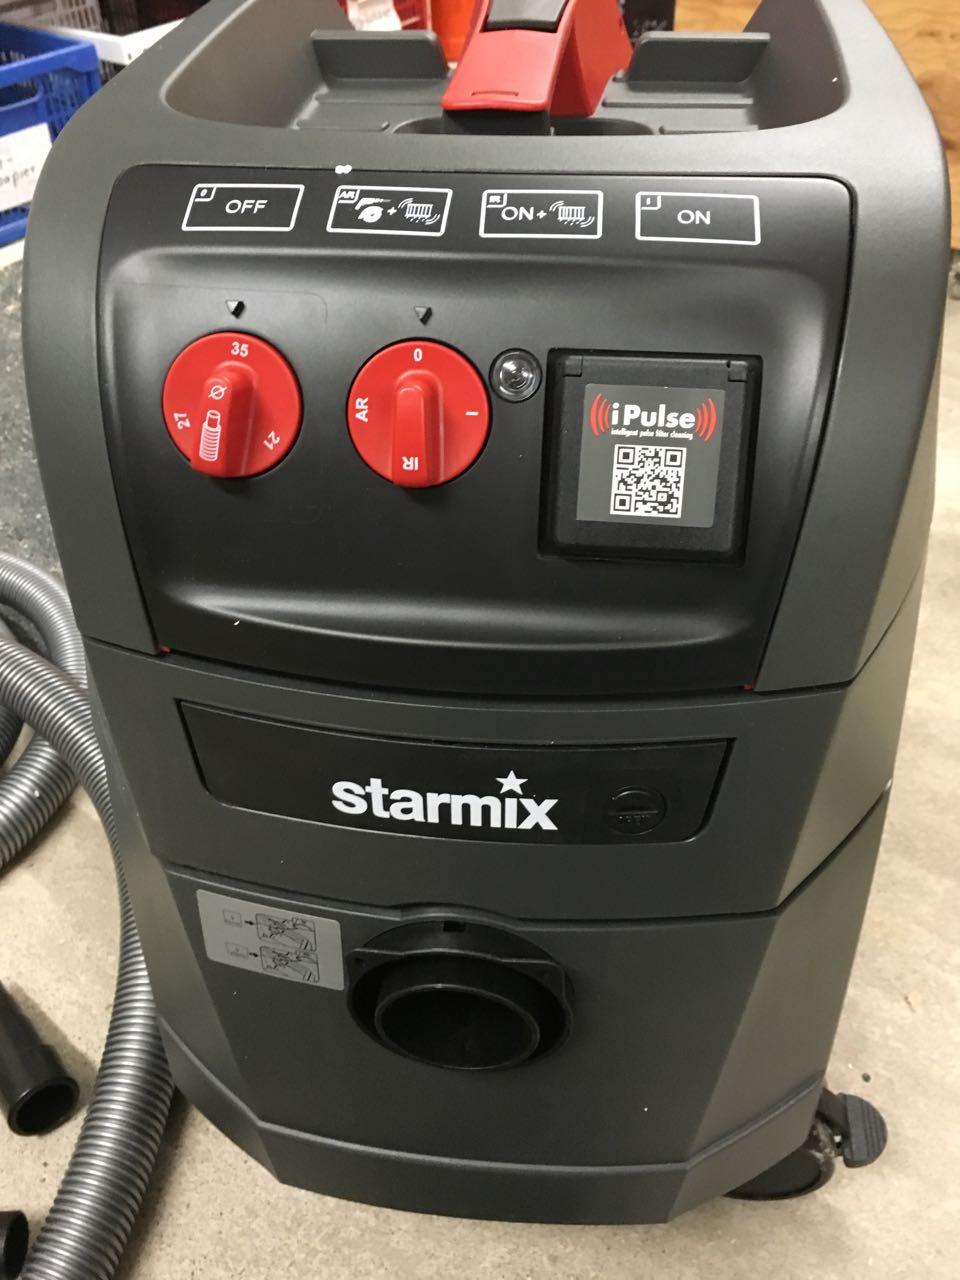 Turbo Starker Sauger - Starmix ISP iPulse ARM-1635 EW - Holz und Leim LM71